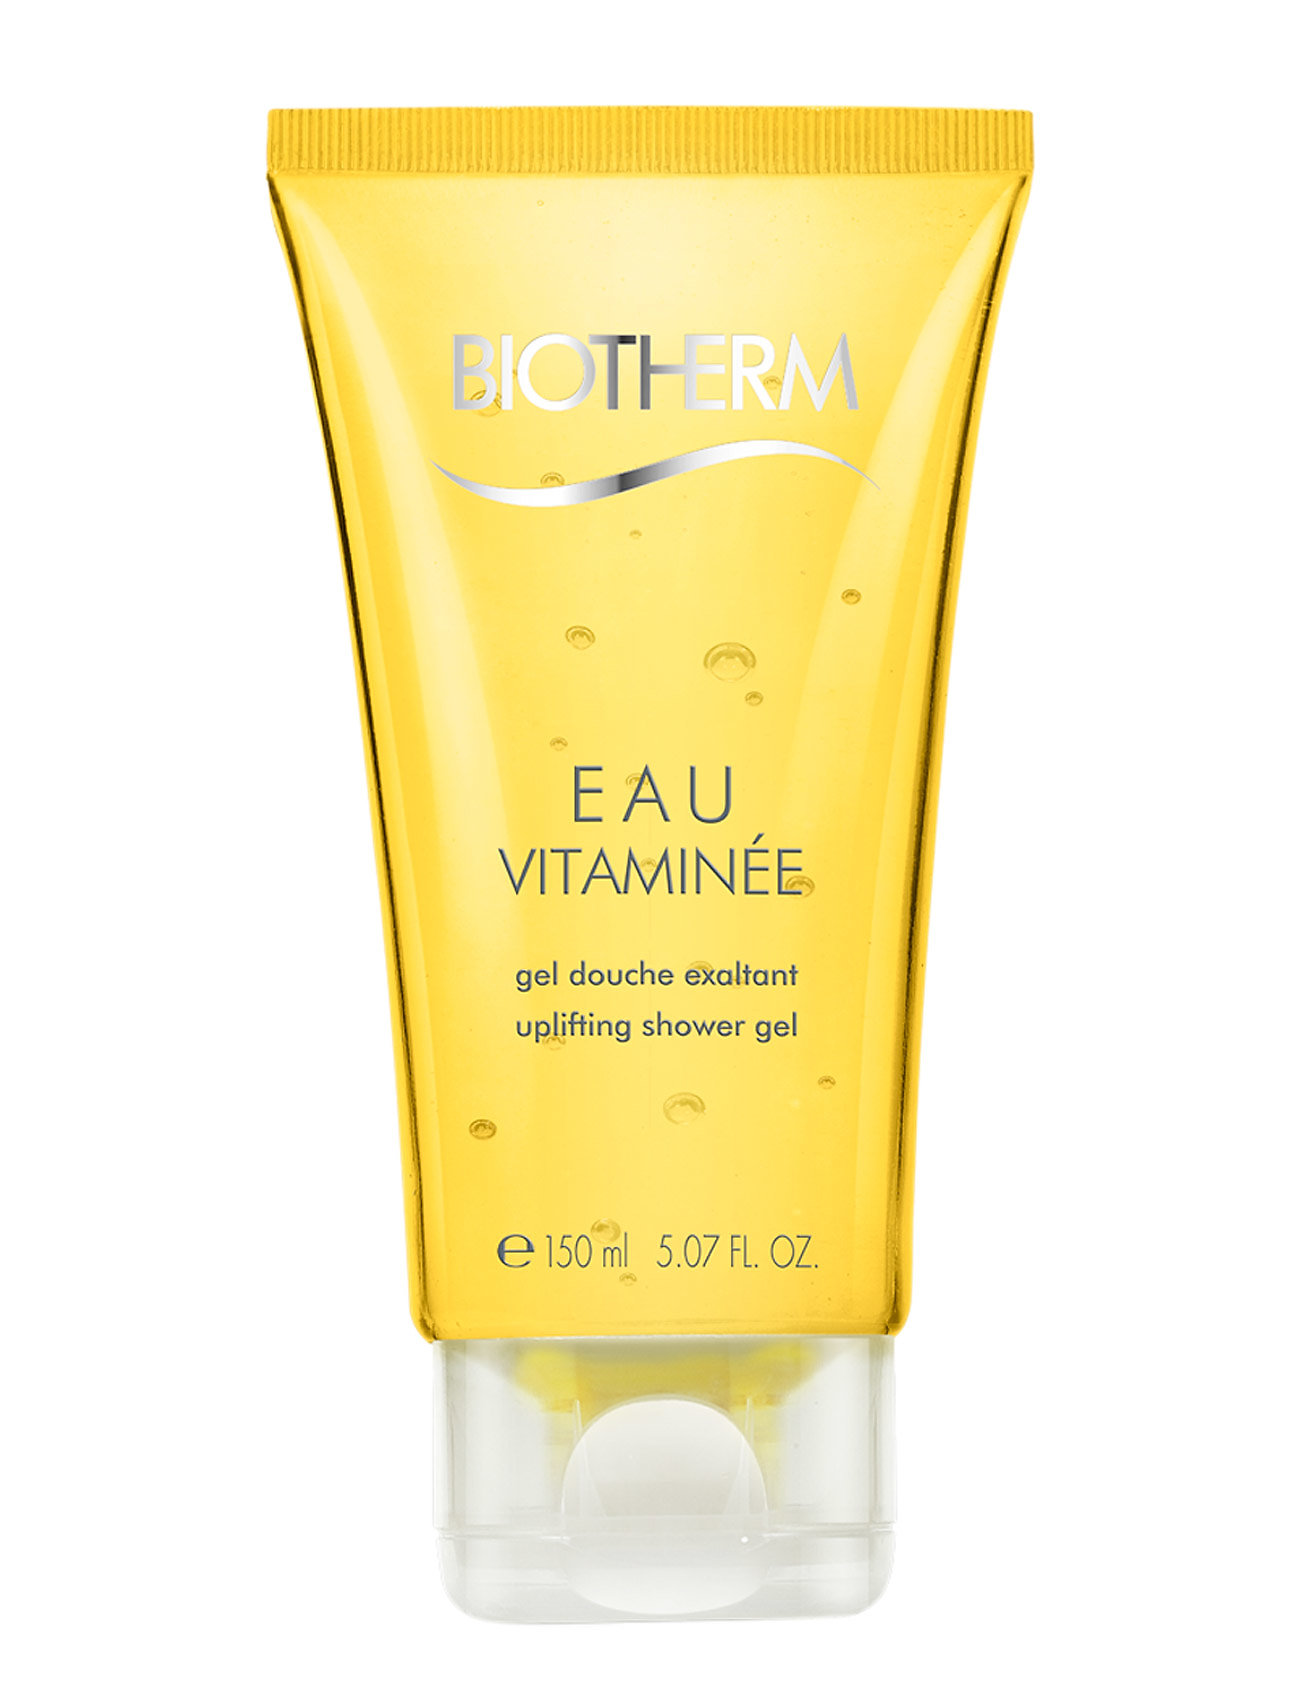 Eau vitaminee shower gel 150 ml fra biotherm fra boozt.com dk